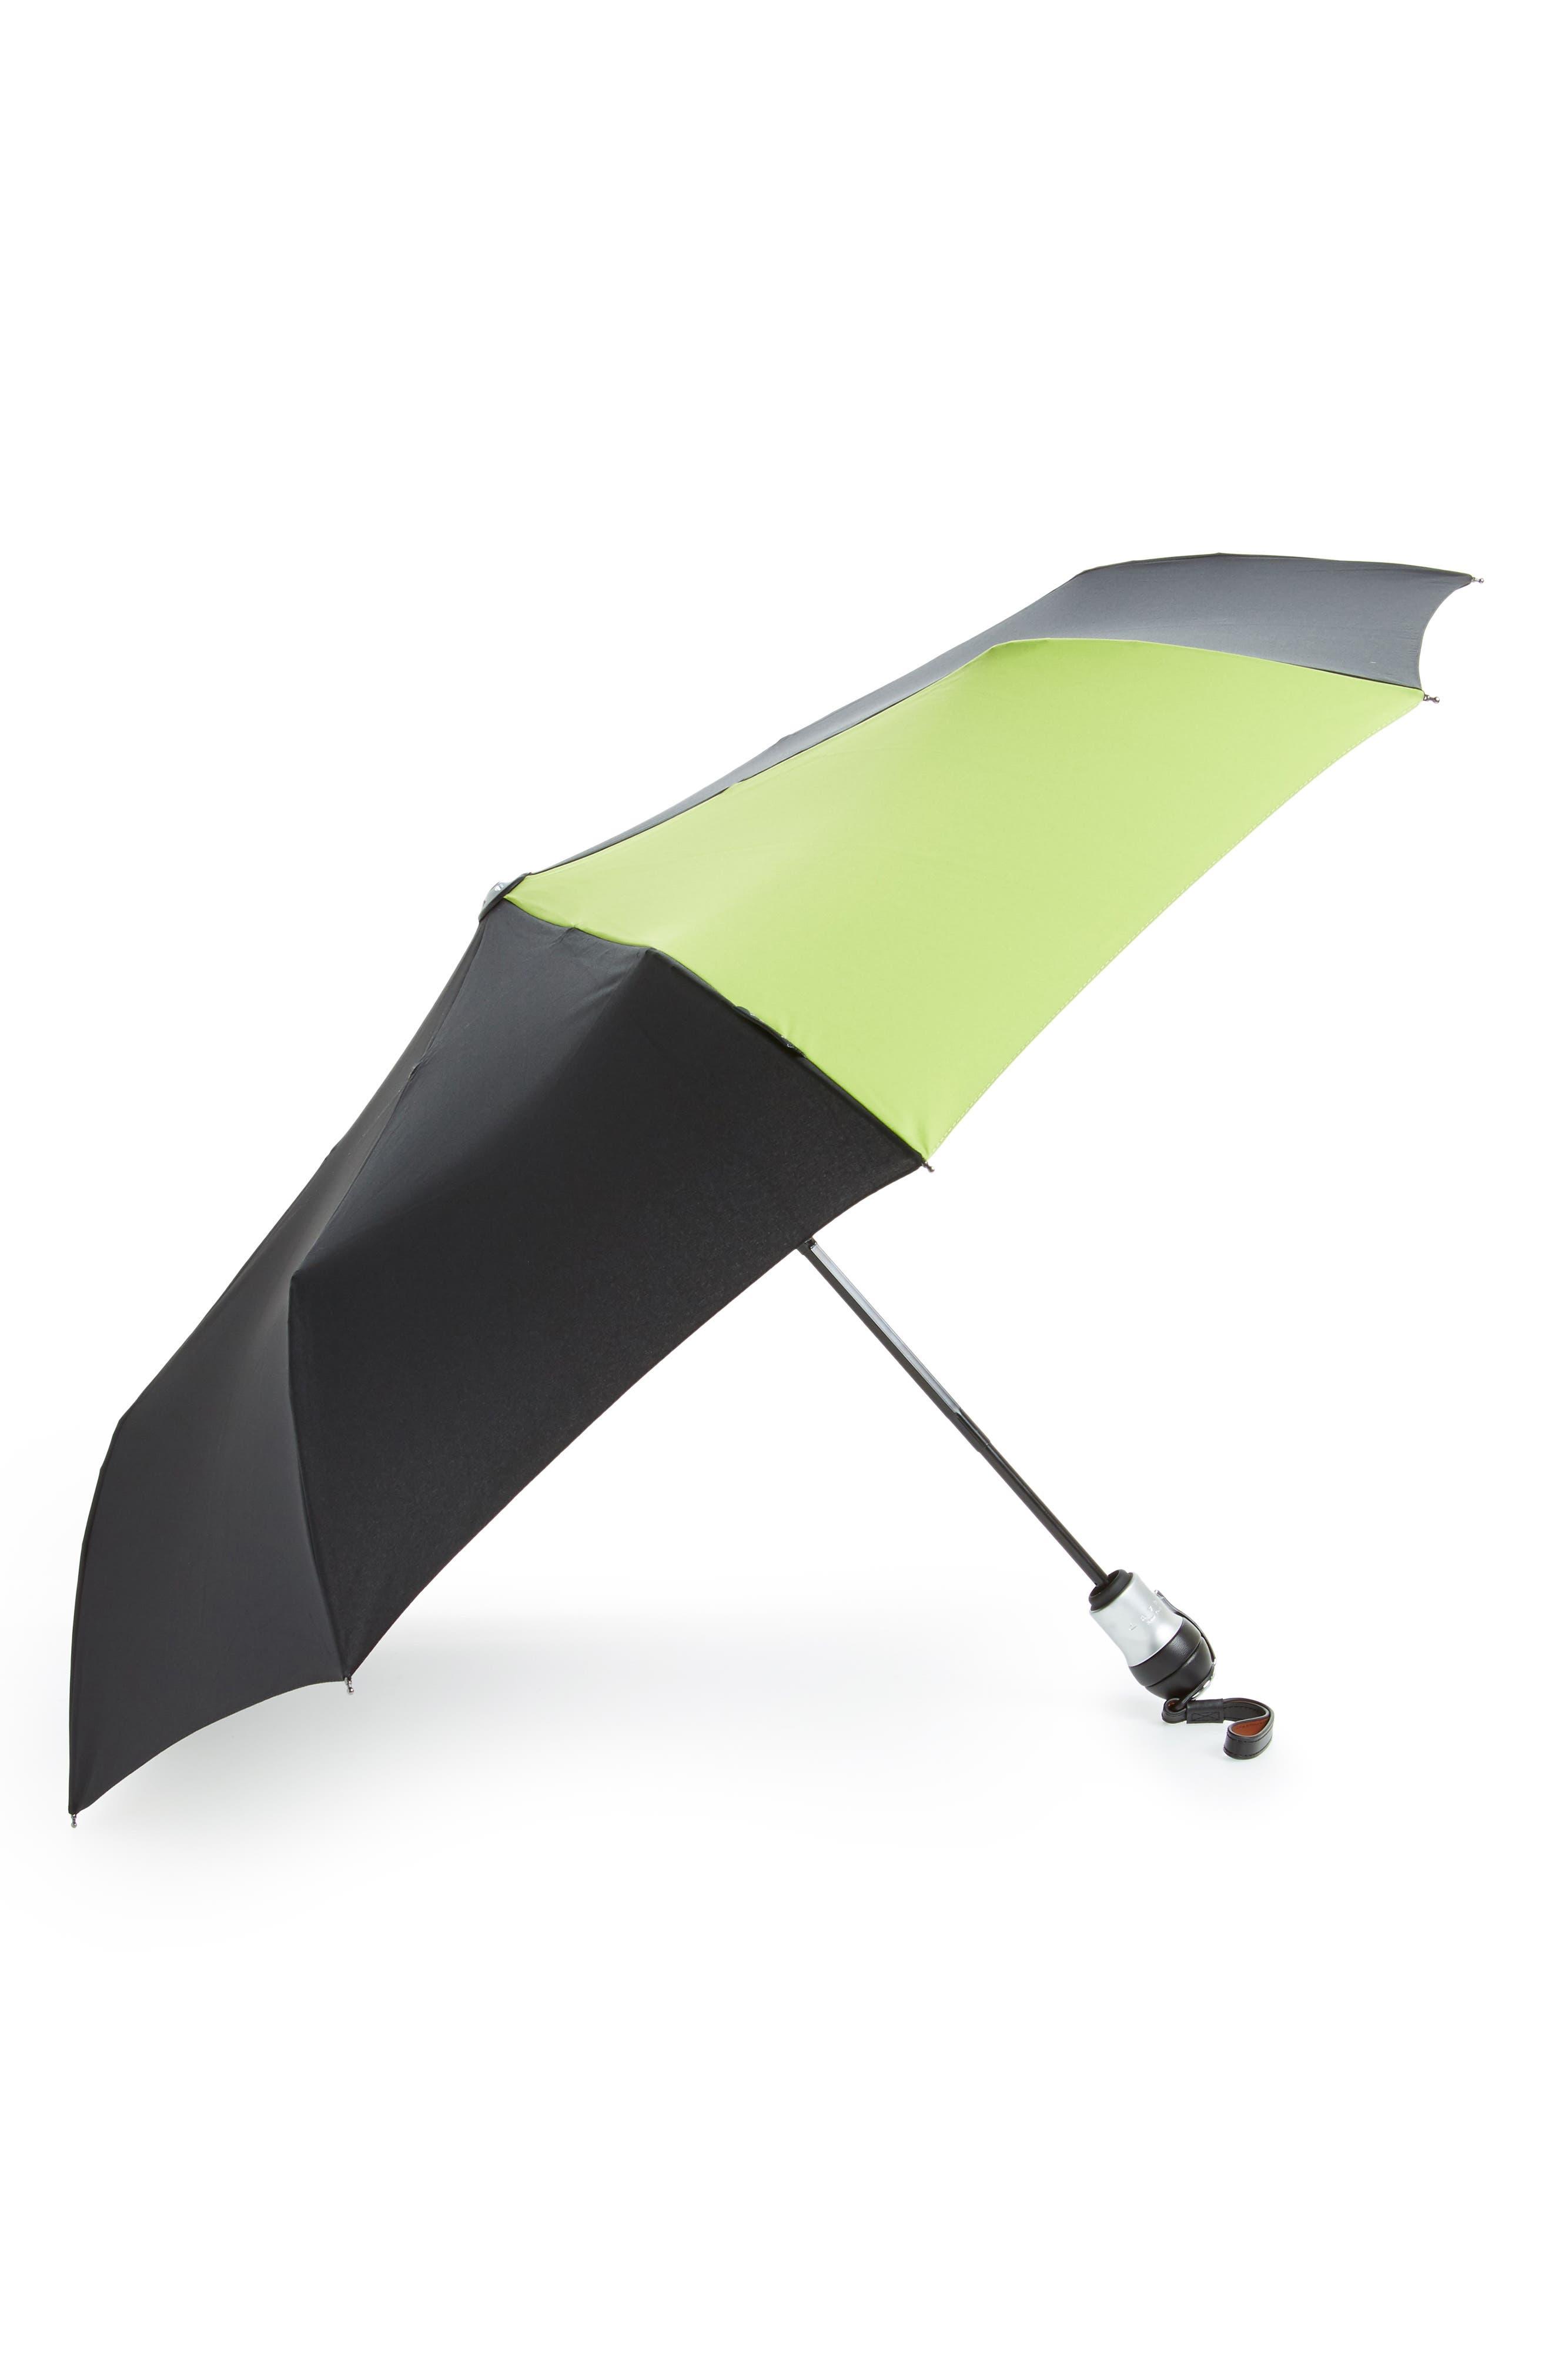 Solo Medium Umbrella,                             Main thumbnail 1, color,                             Black/ Wasabi Green